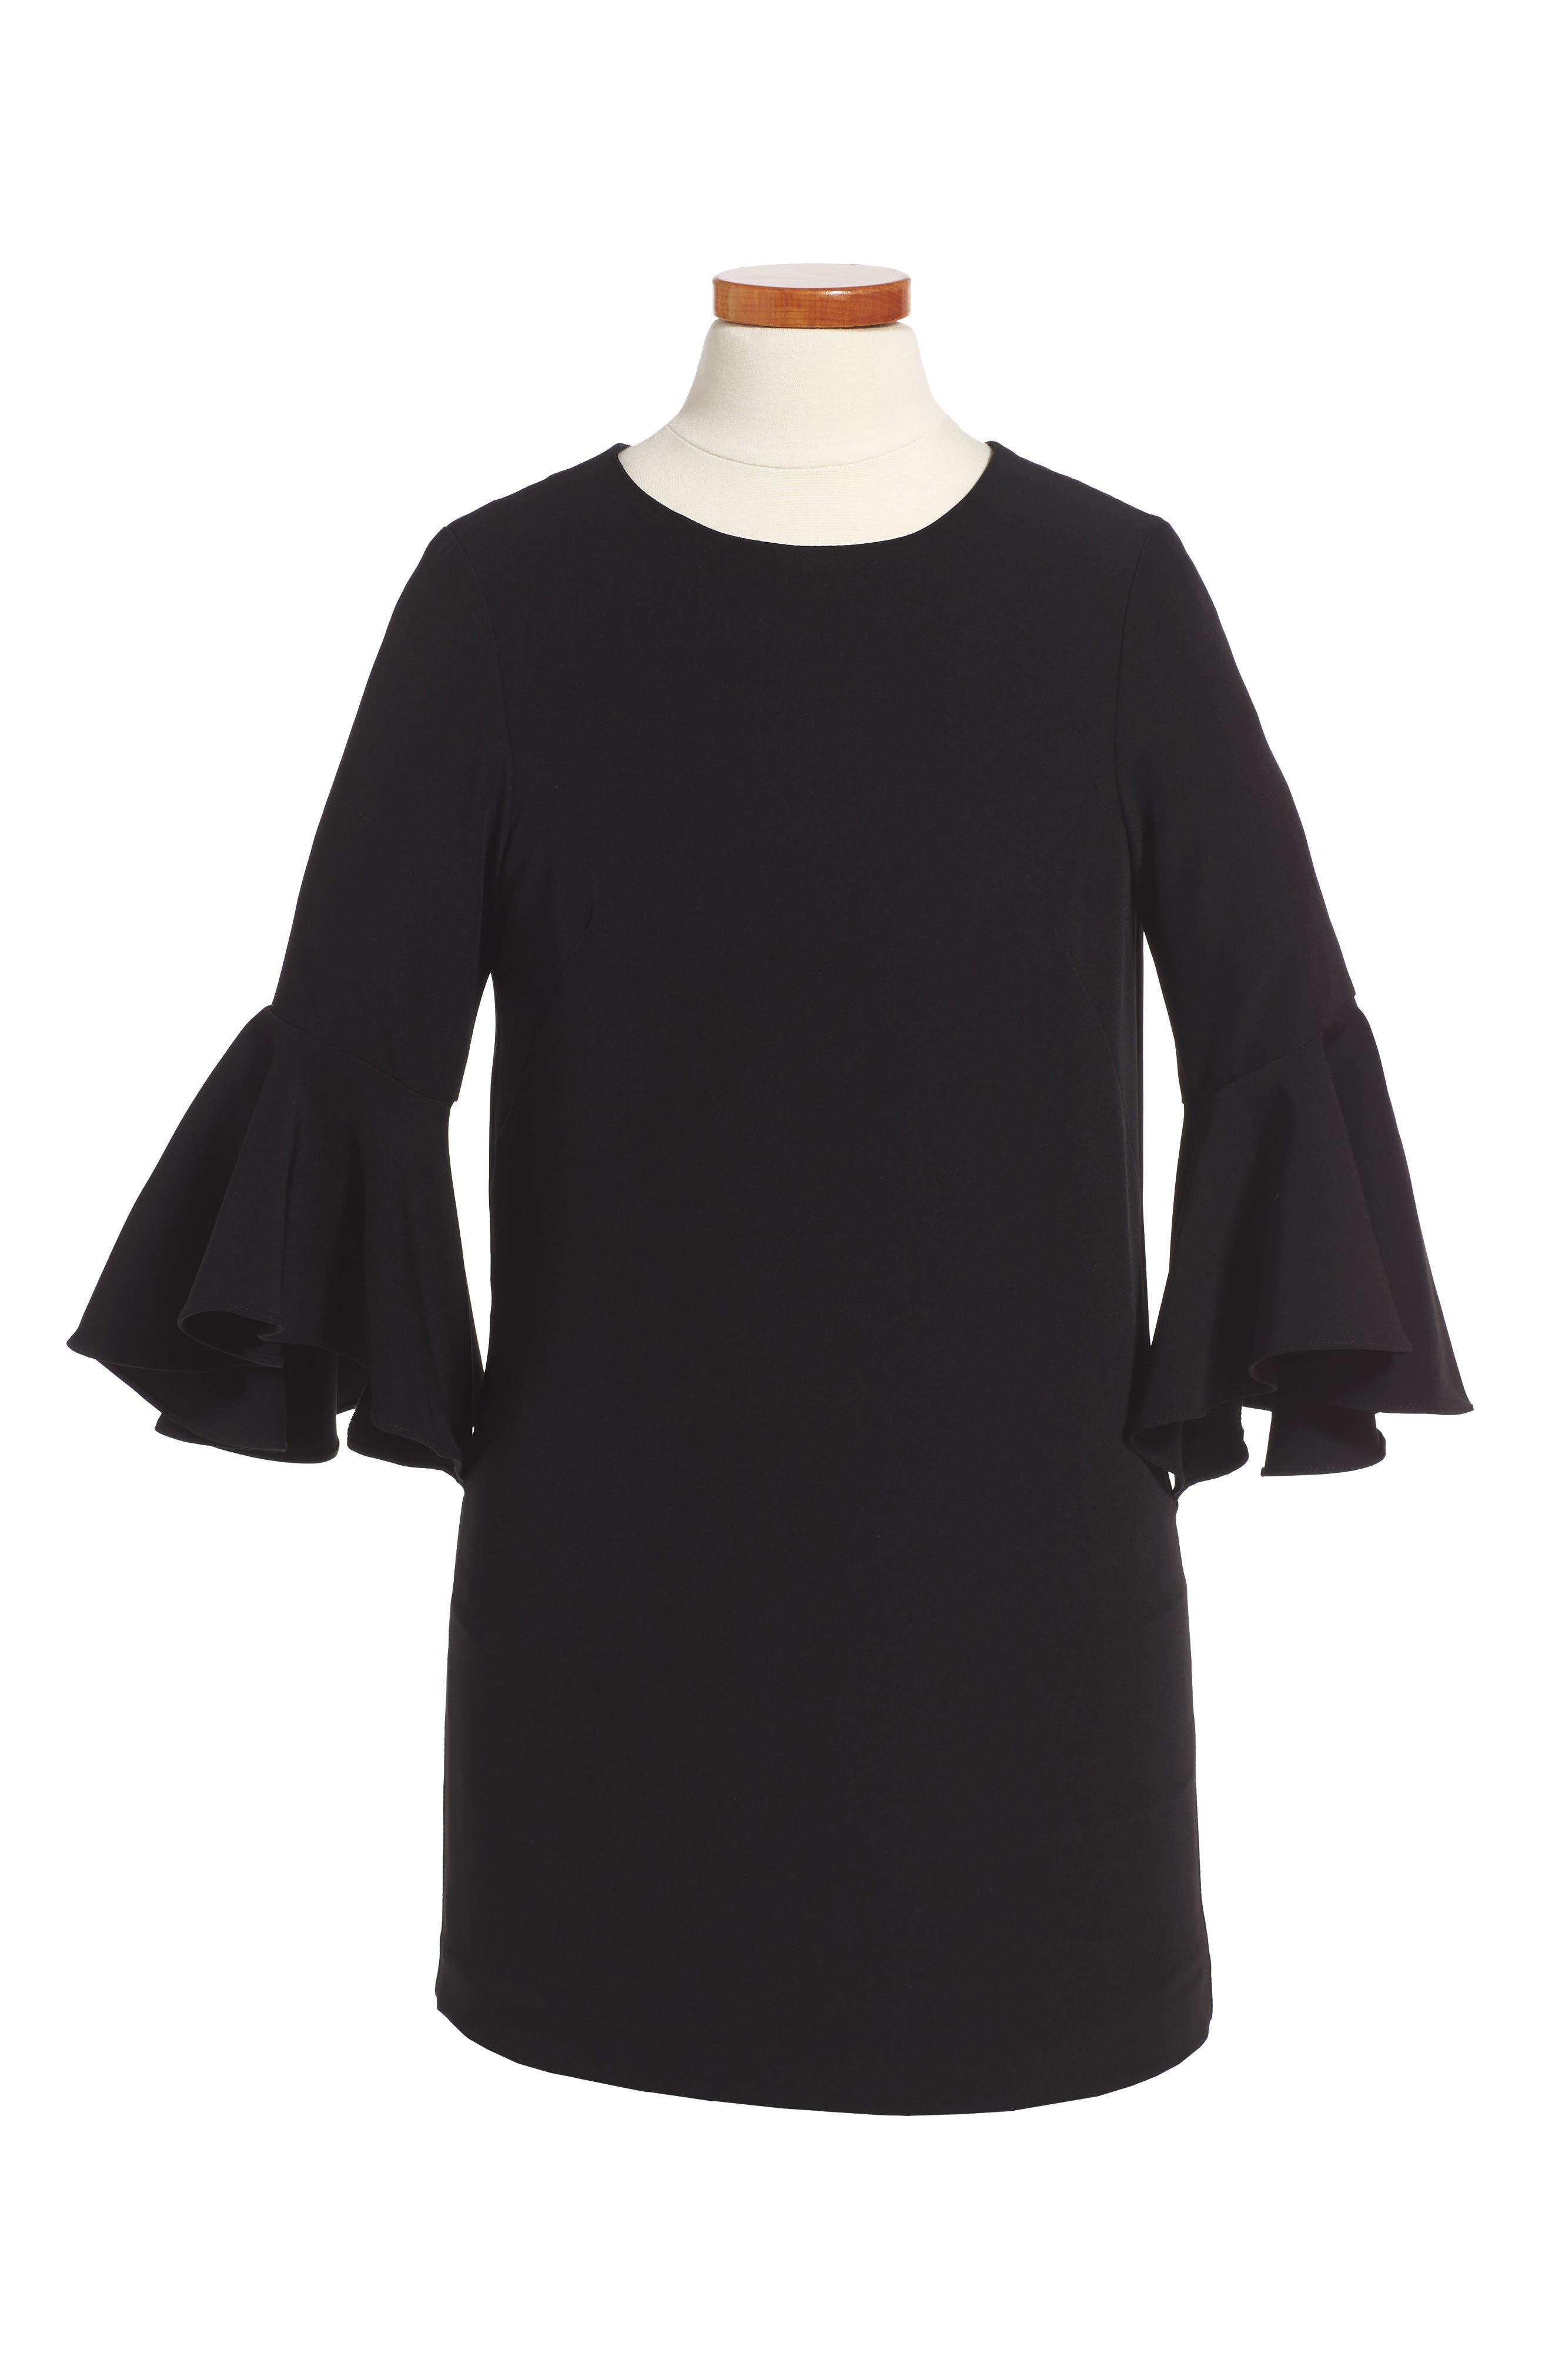 Alternate Image 1 Selected - Milly Minis Italian Cady Nicola Dress (Toddler Girls, Little Girls & Big Girls)